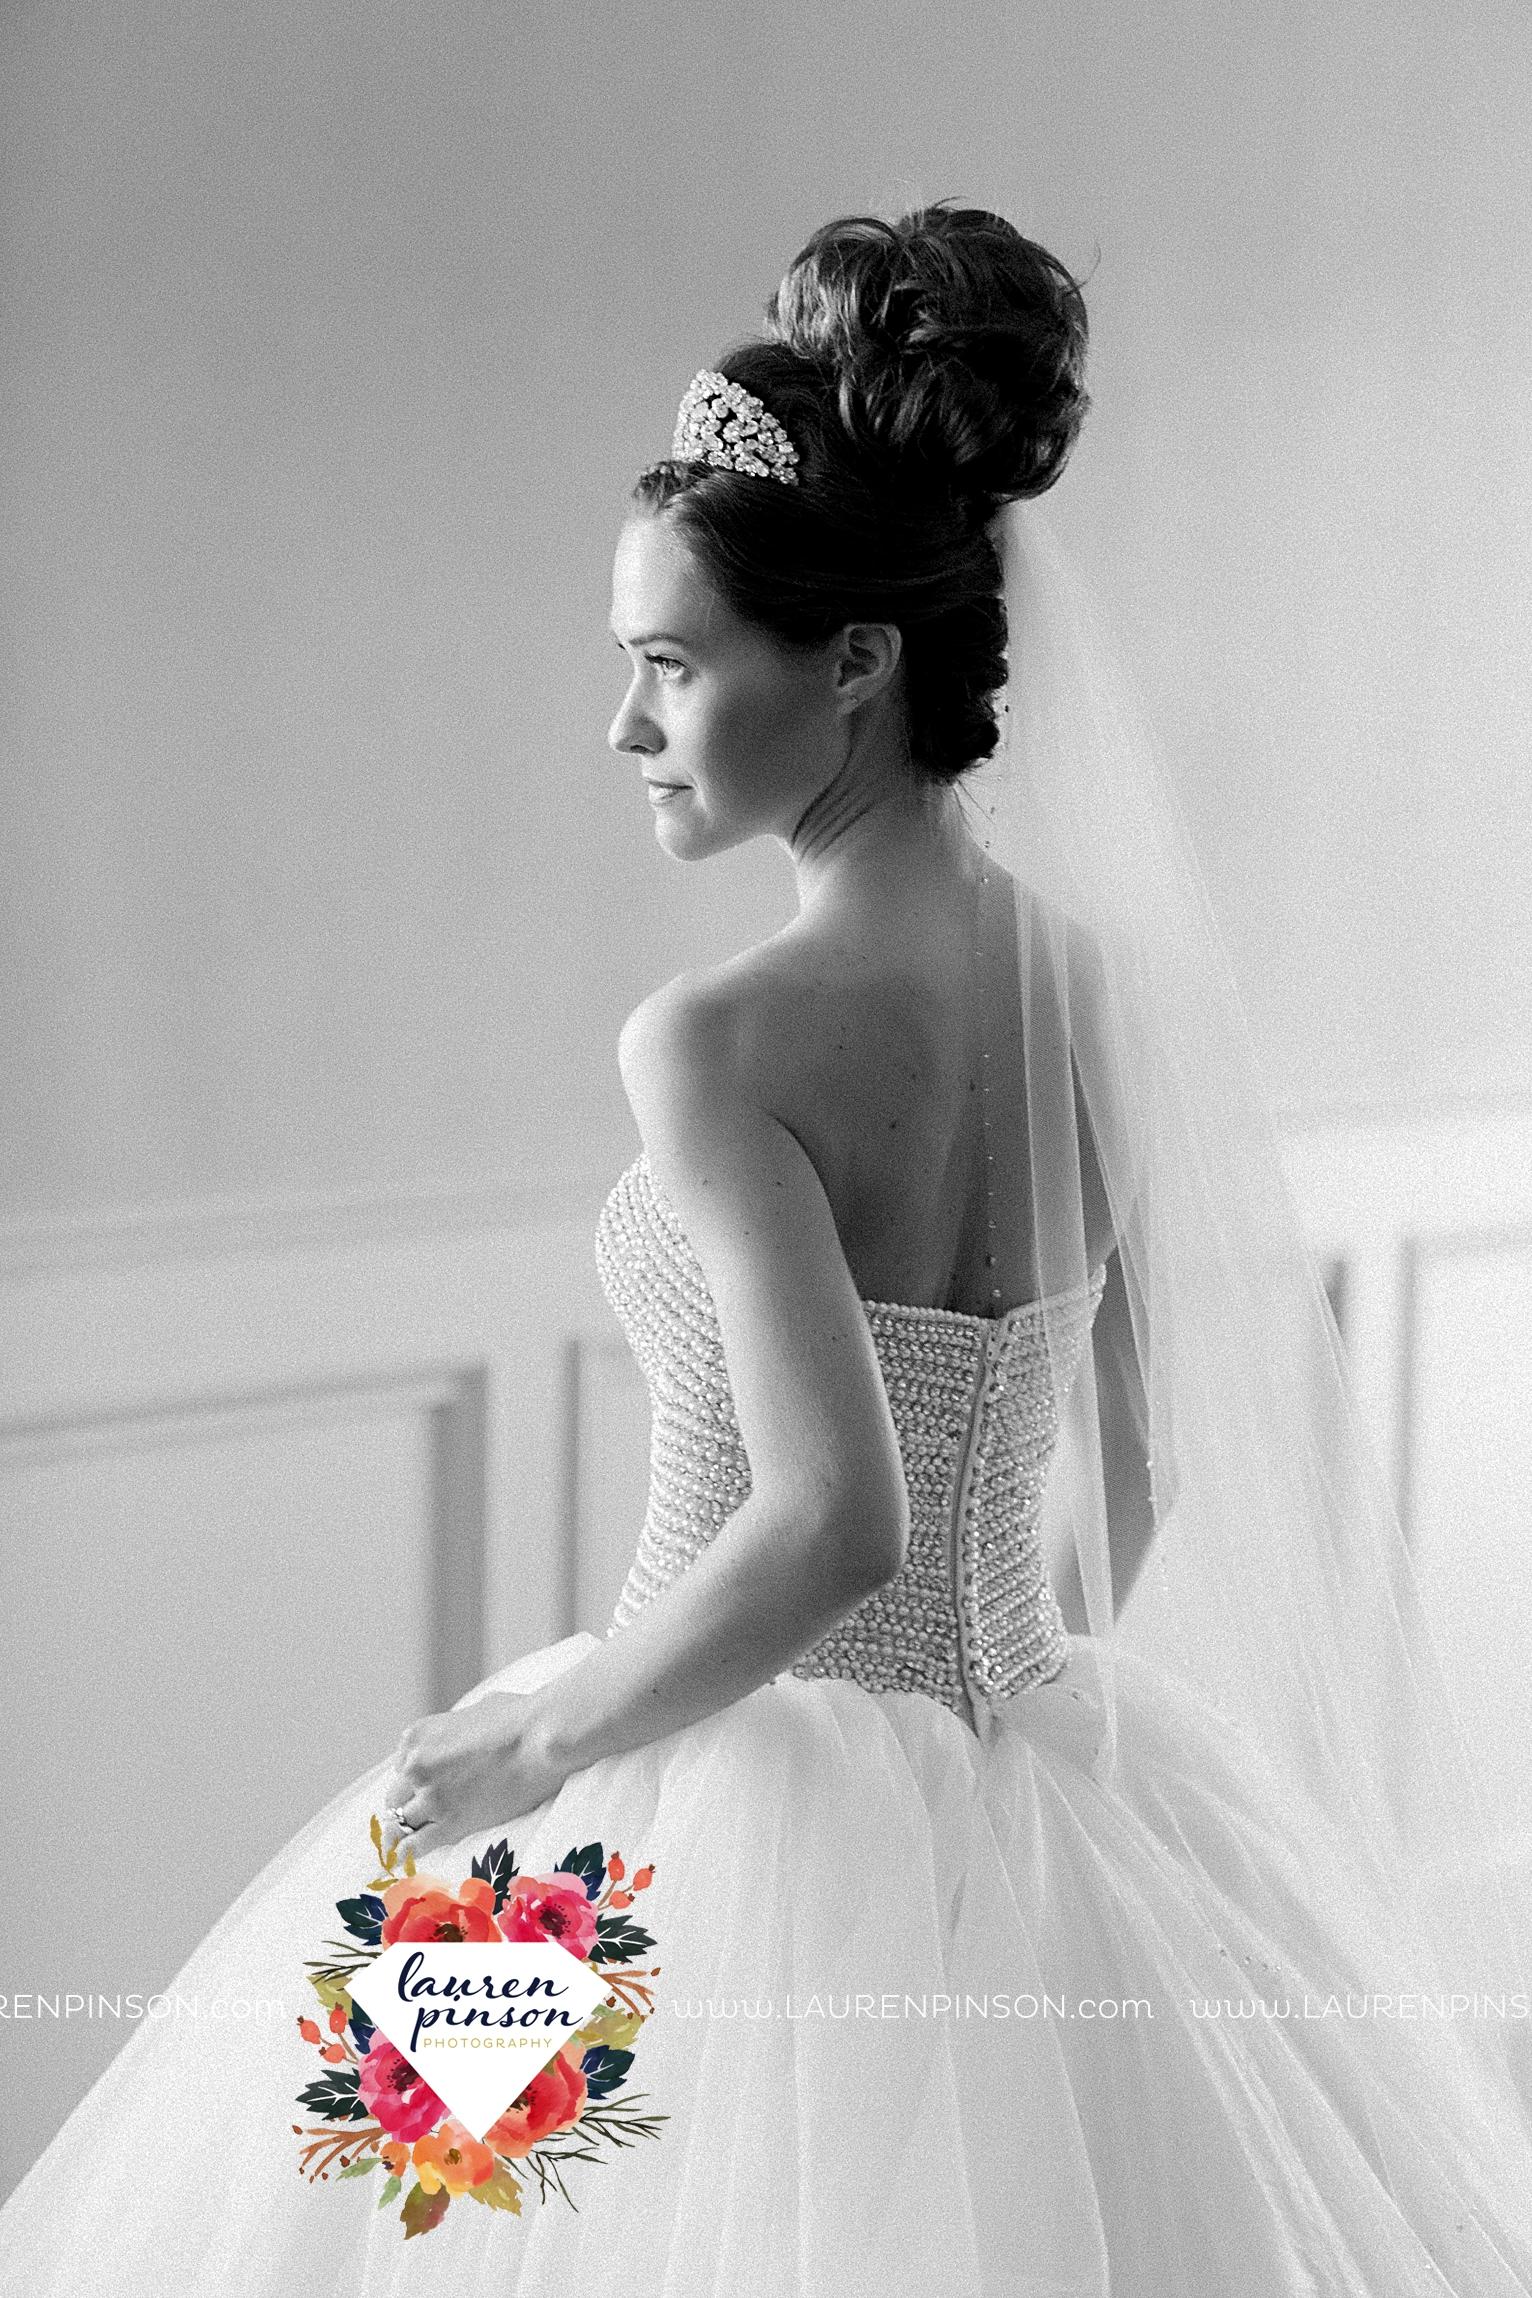 wichita-falls-texas-wedding-photographer-the-forum-by-the-kemp-mayfield-events-ulta-gold-glitter_2814.jpg